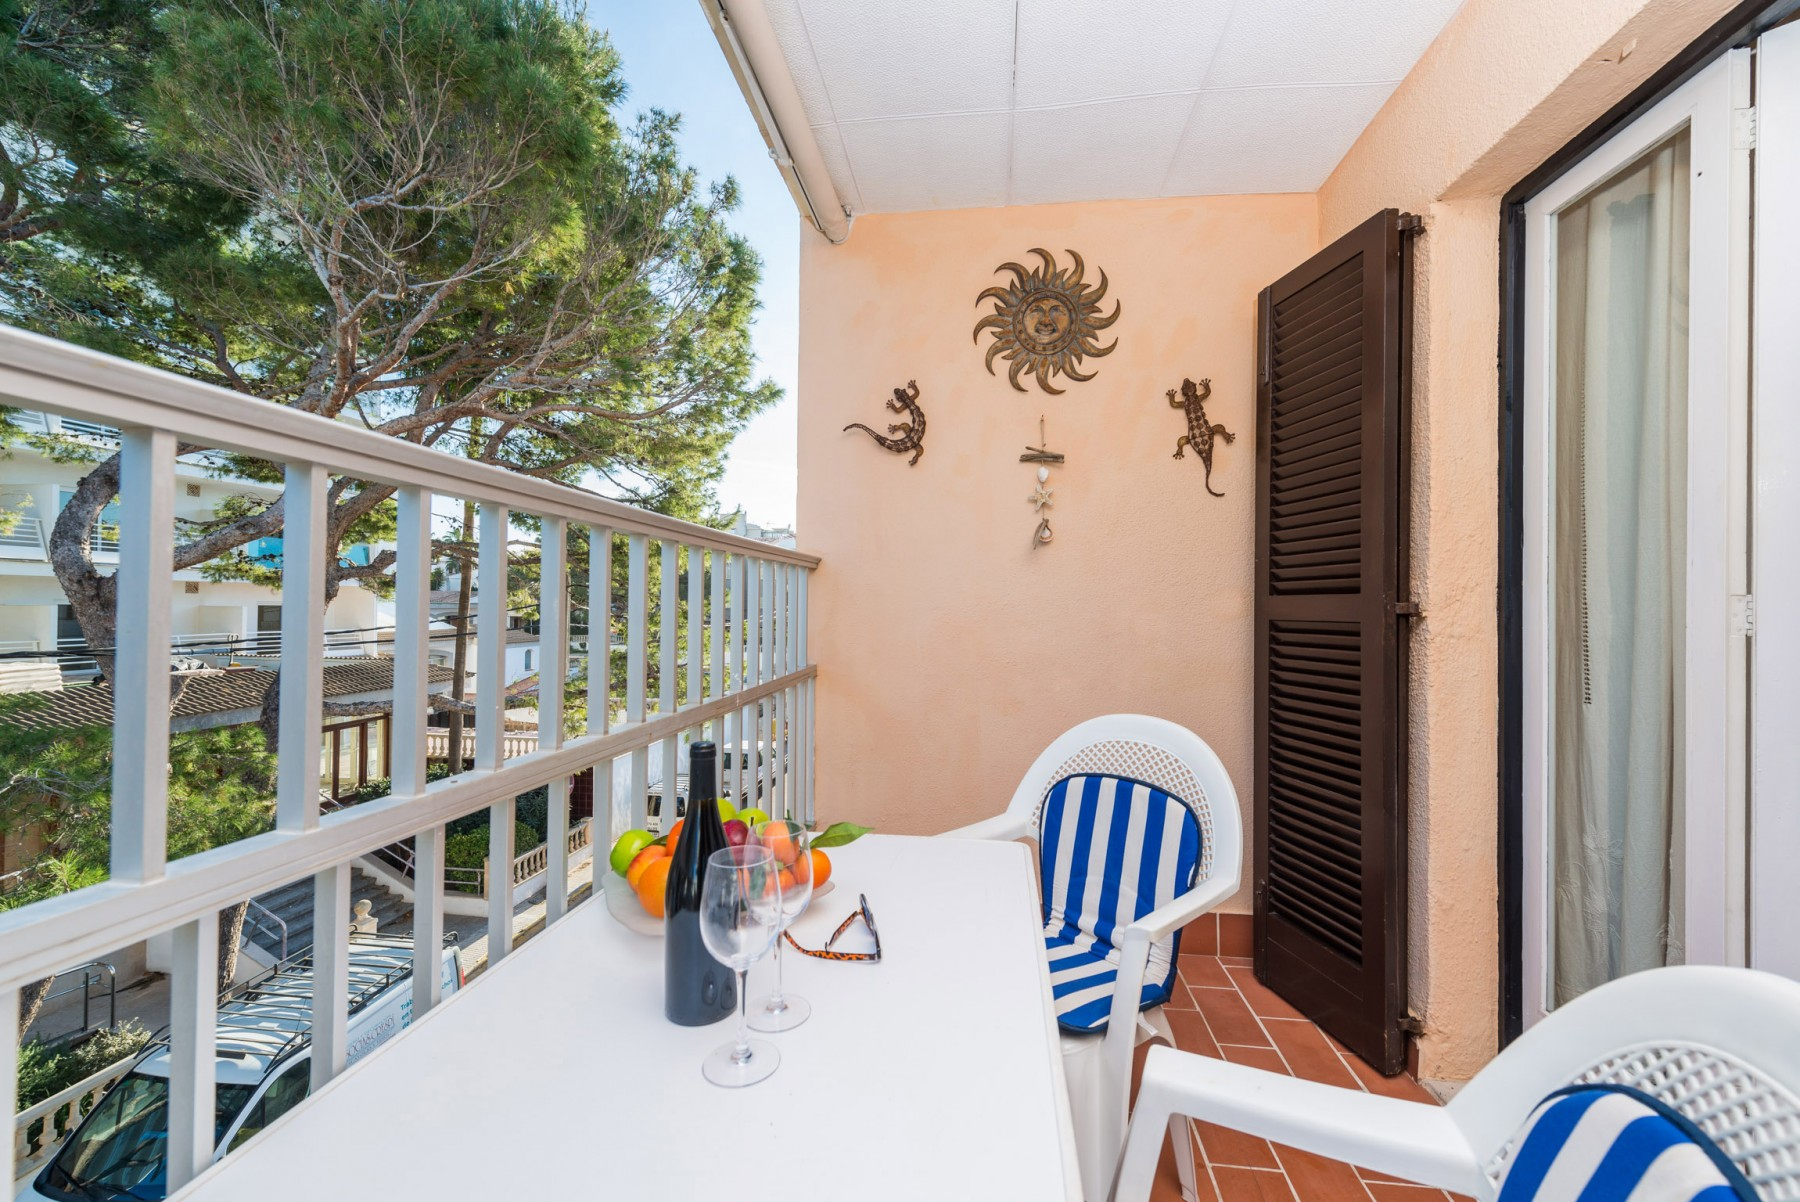 TAST - 1346 for 6 guests in Santa Margalida, Spanien